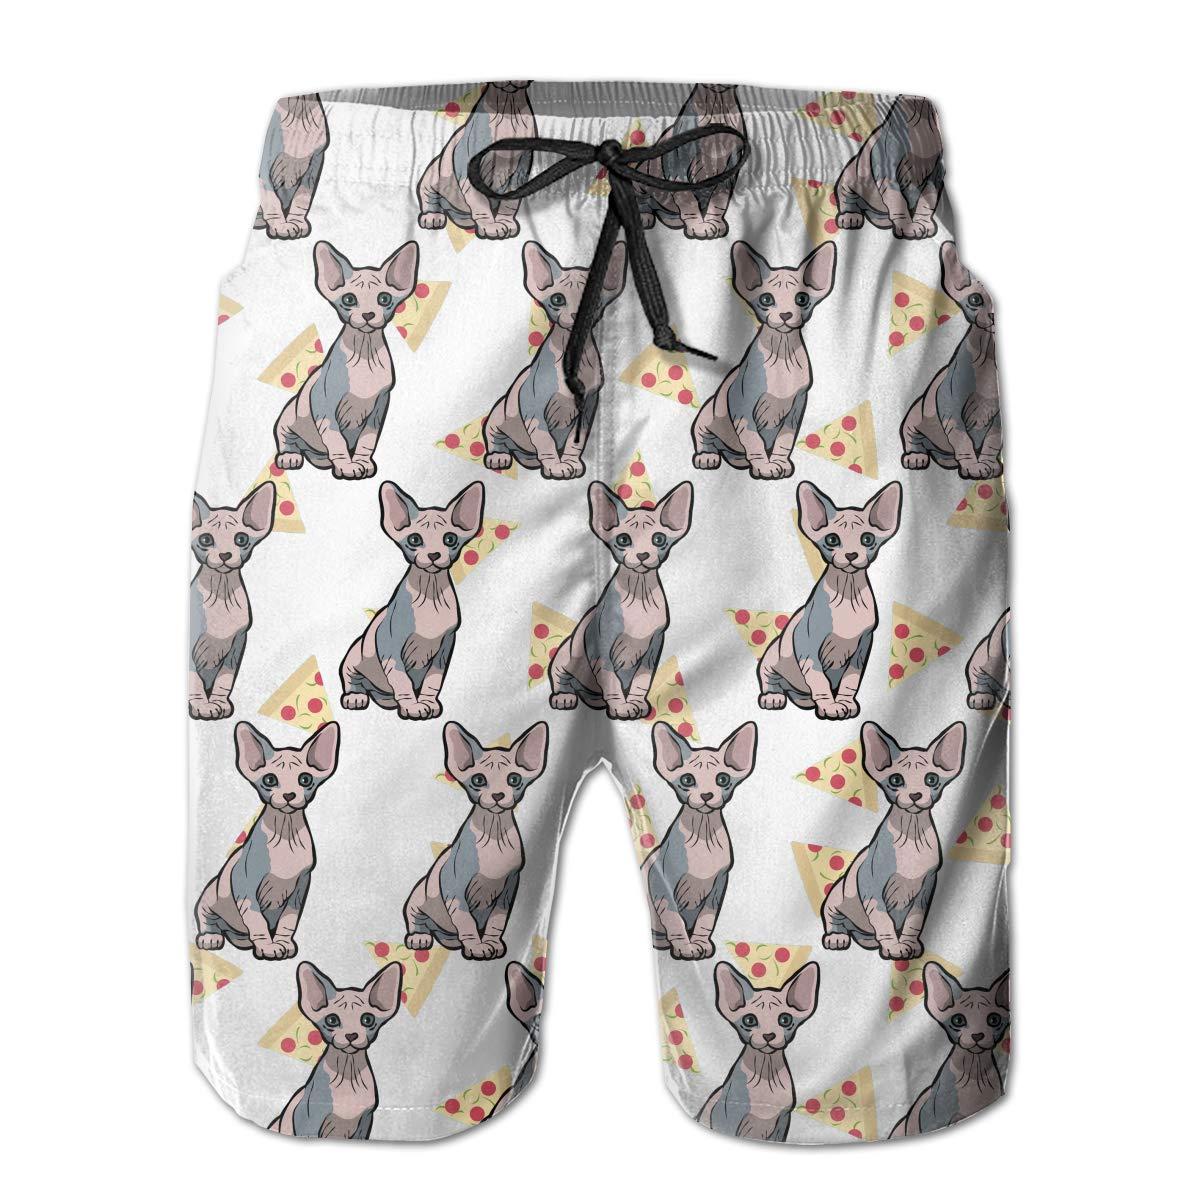 Mens Casual Sphynx Cat Taco 3D Print Graphic Medium Length Summer Drawstring Beach Shorts Surfing Trunks Pants